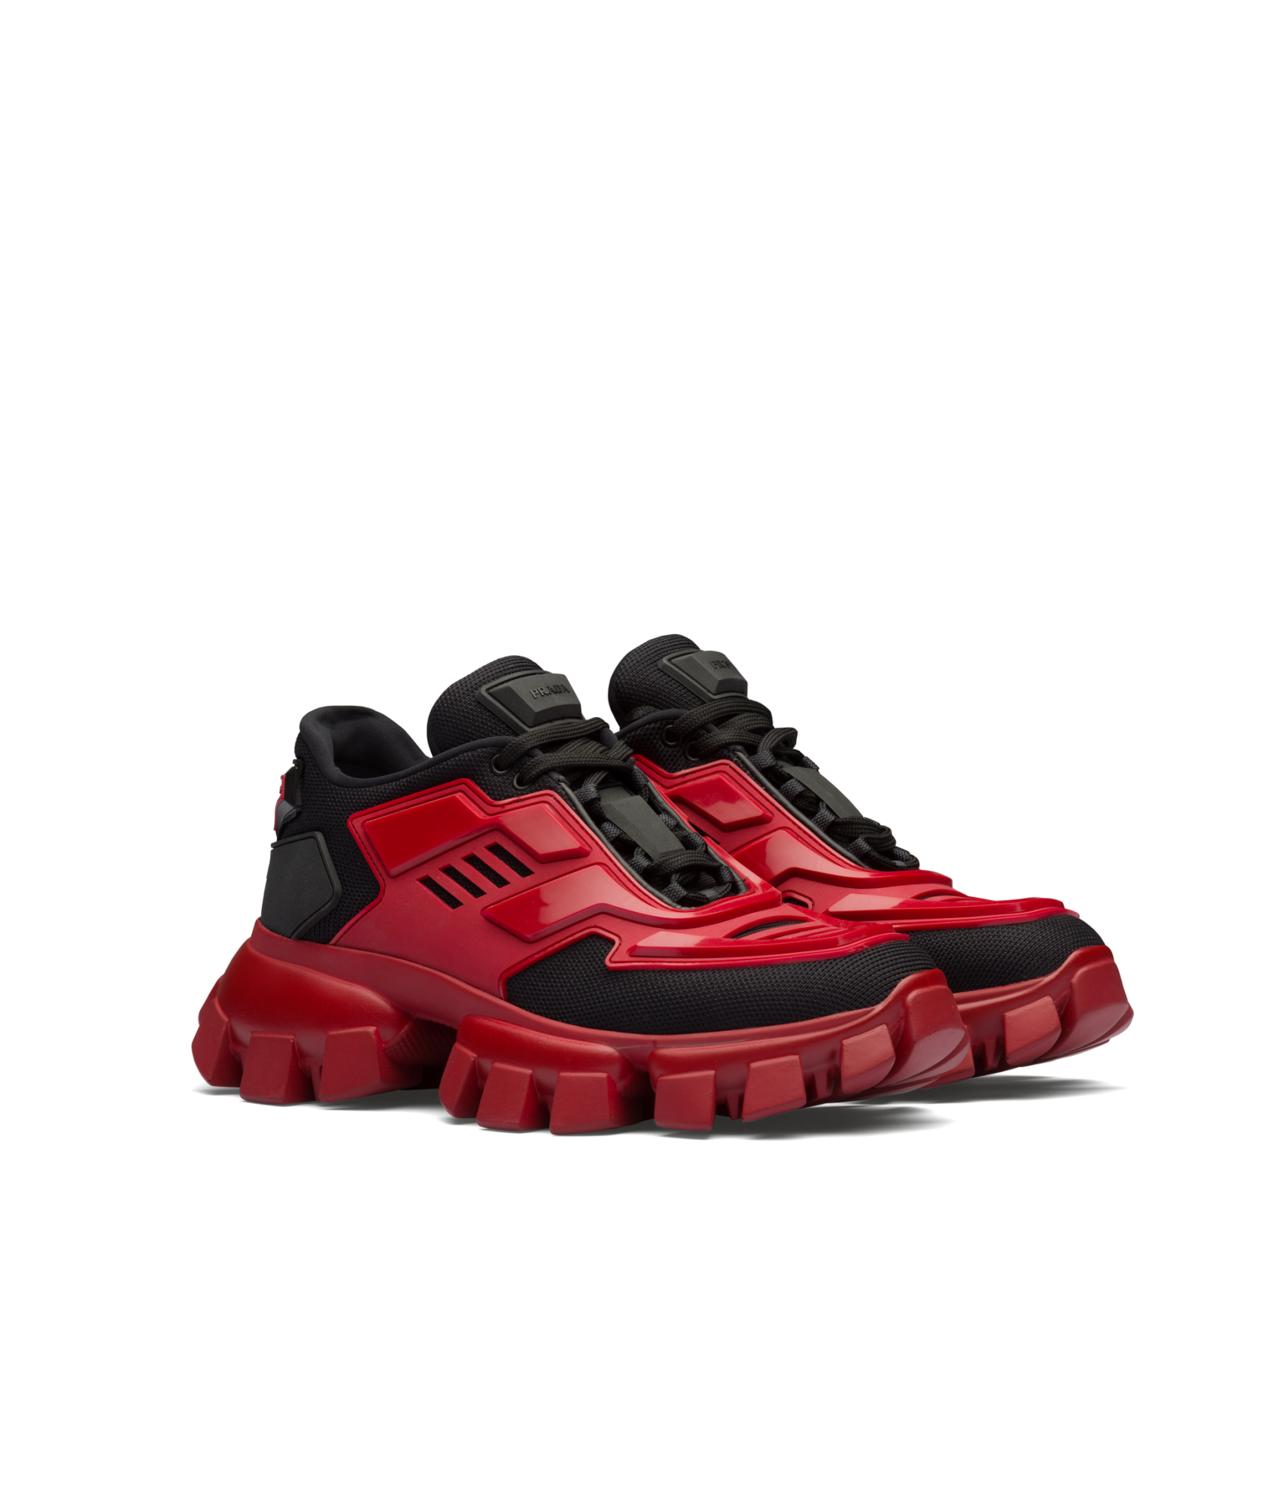 Cloudbust Thunder紅色休閒鞋,37,000元。圖/PRADA提供